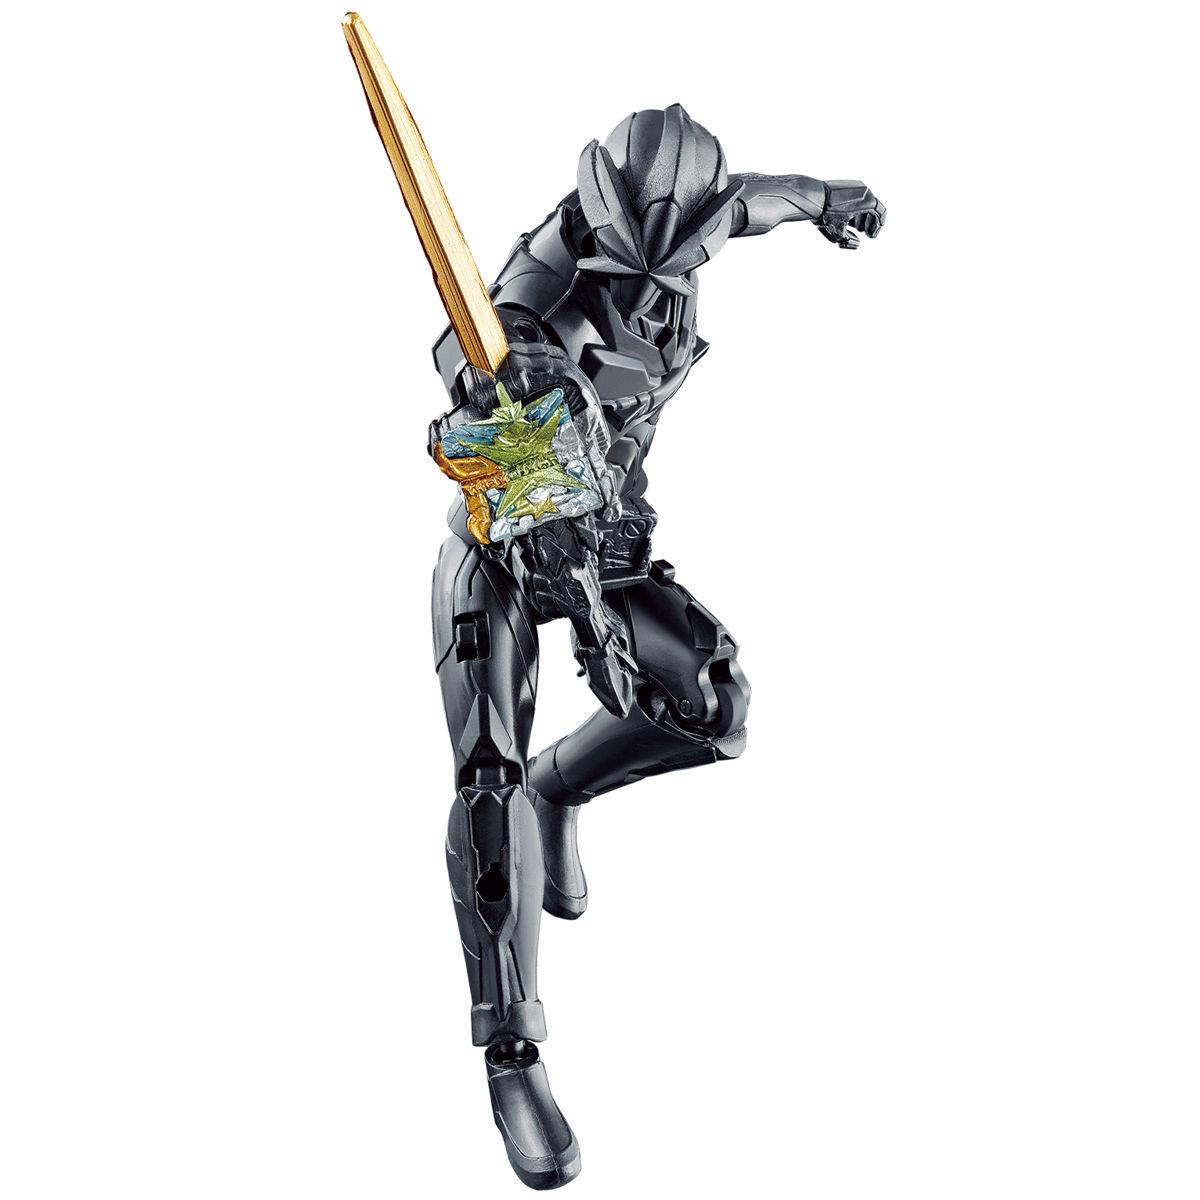 RKF『仮面ライダー最光 最高パーフェクトセット』仮面ライダーセイバー 可変可動フィギュア-003